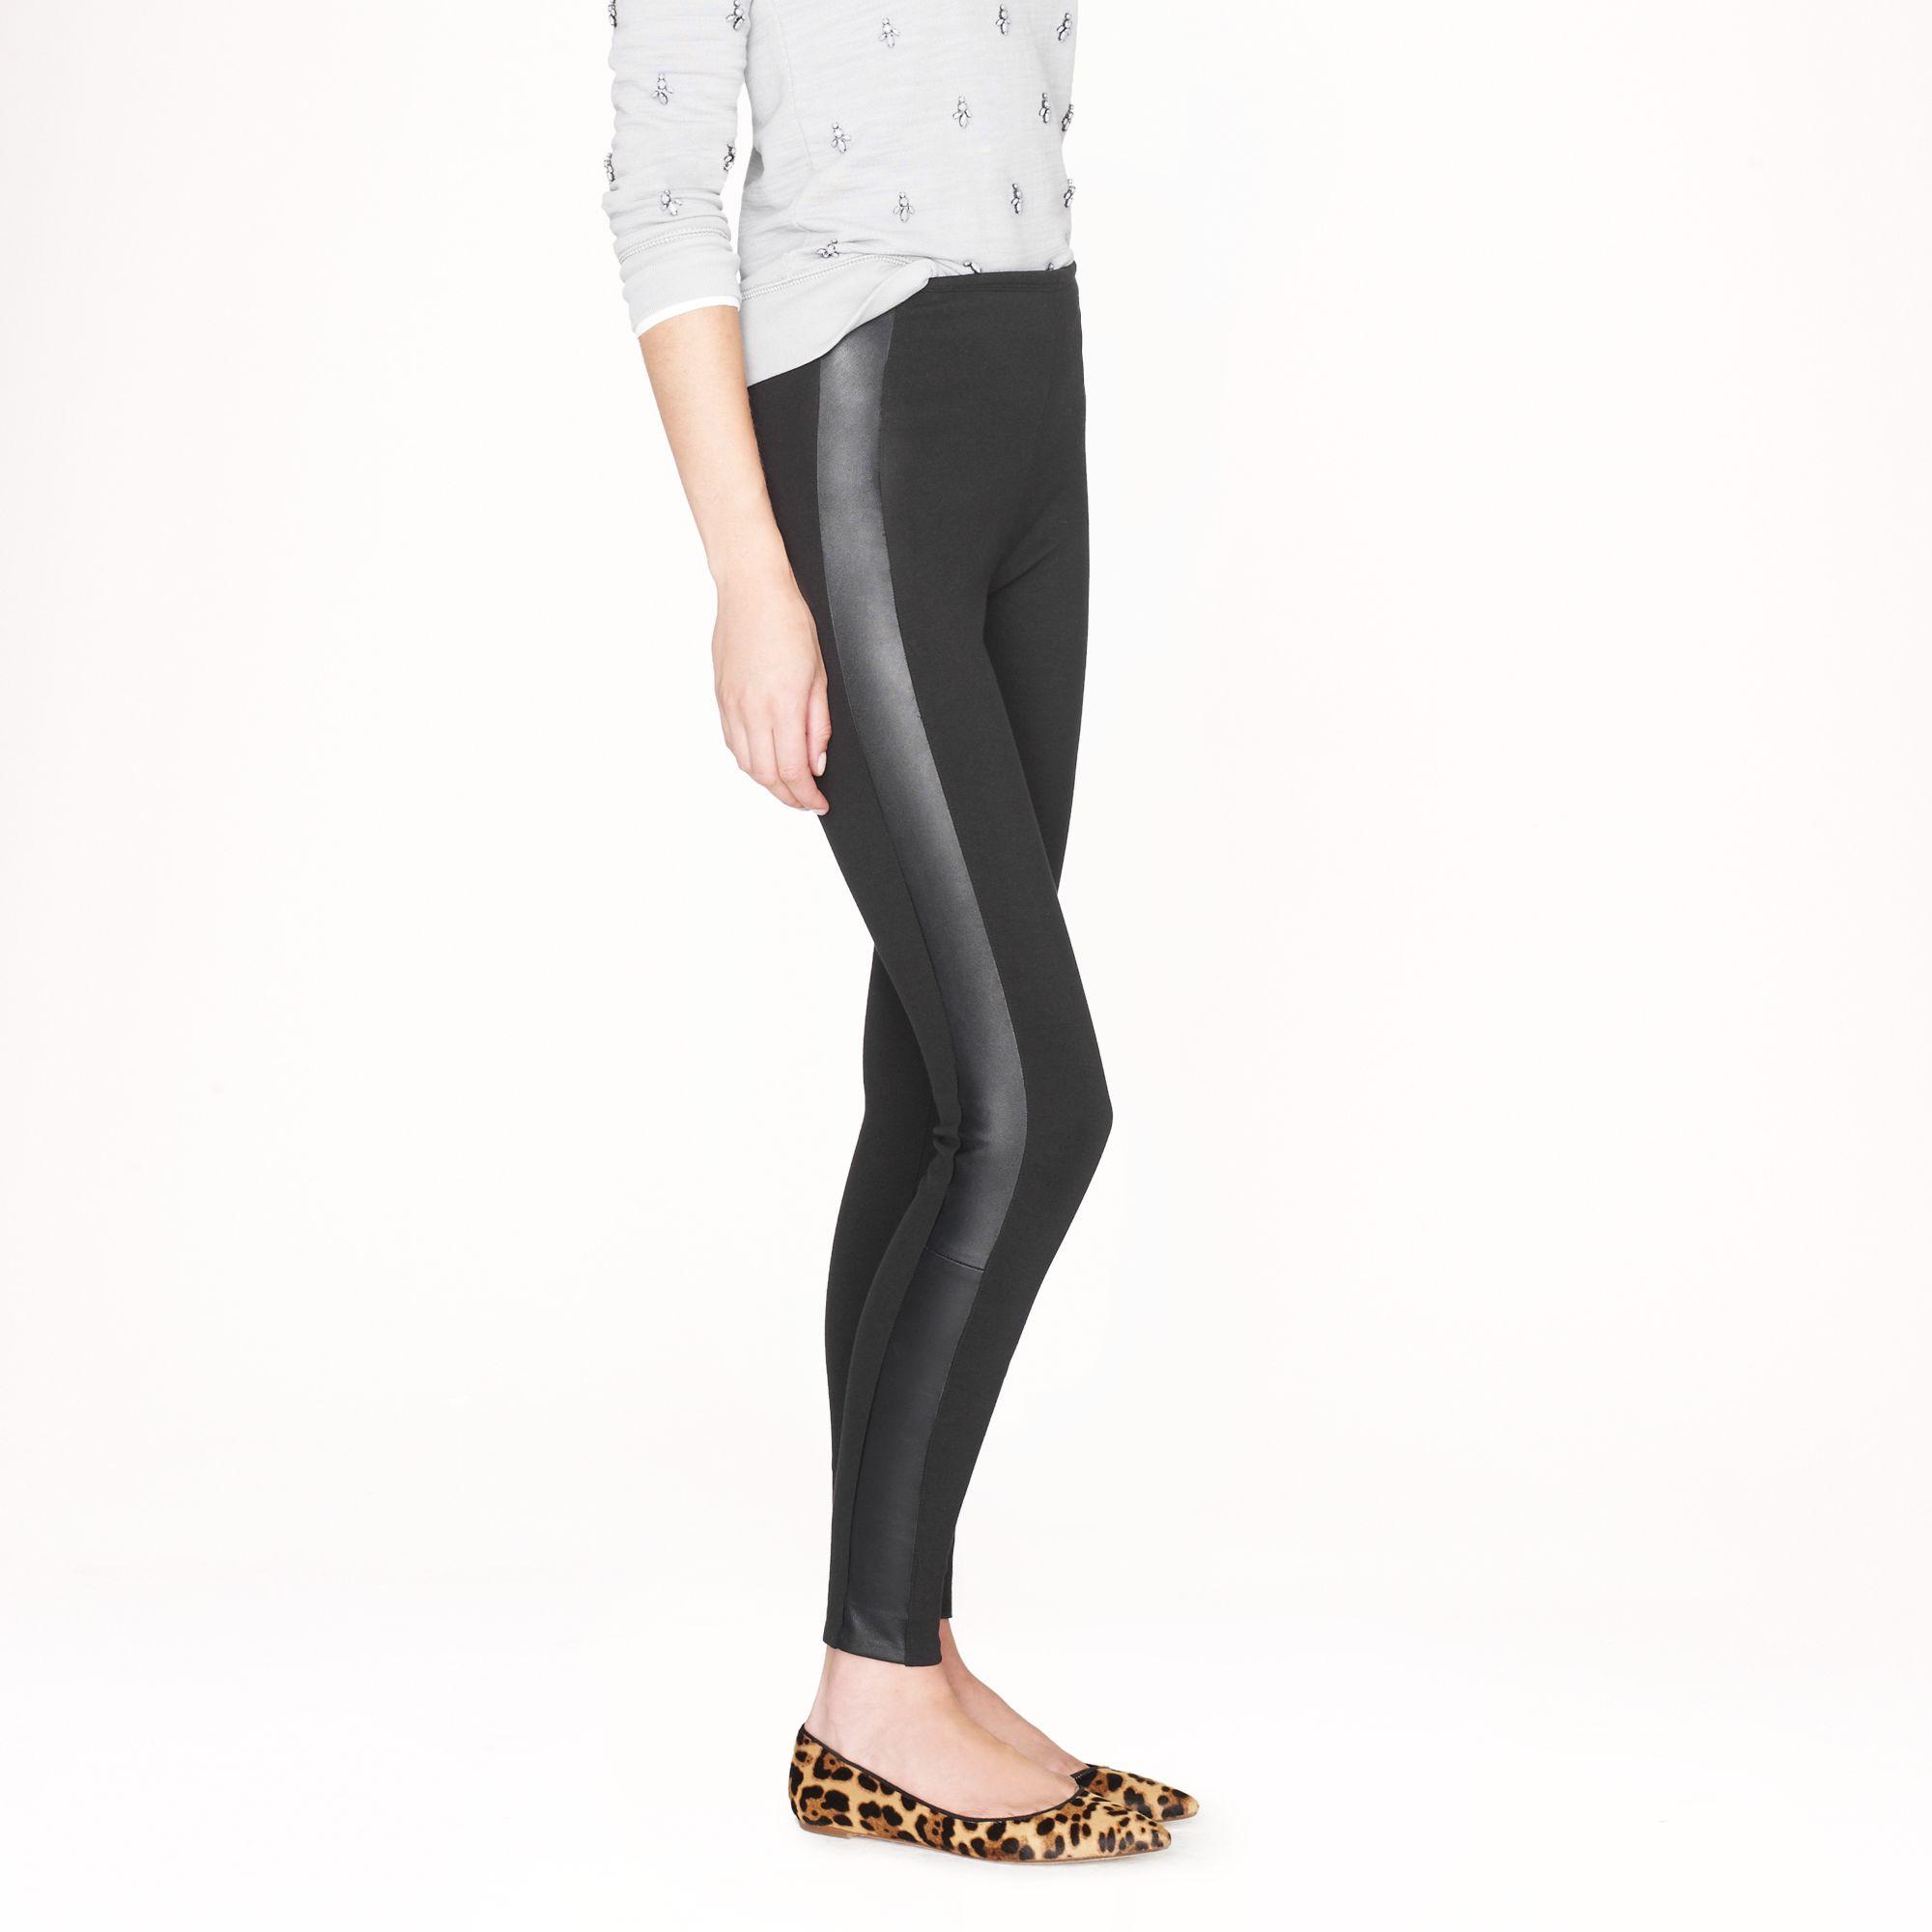 J Crew Tall Pixie Pant In Leather Tuxedo Stripe In Black